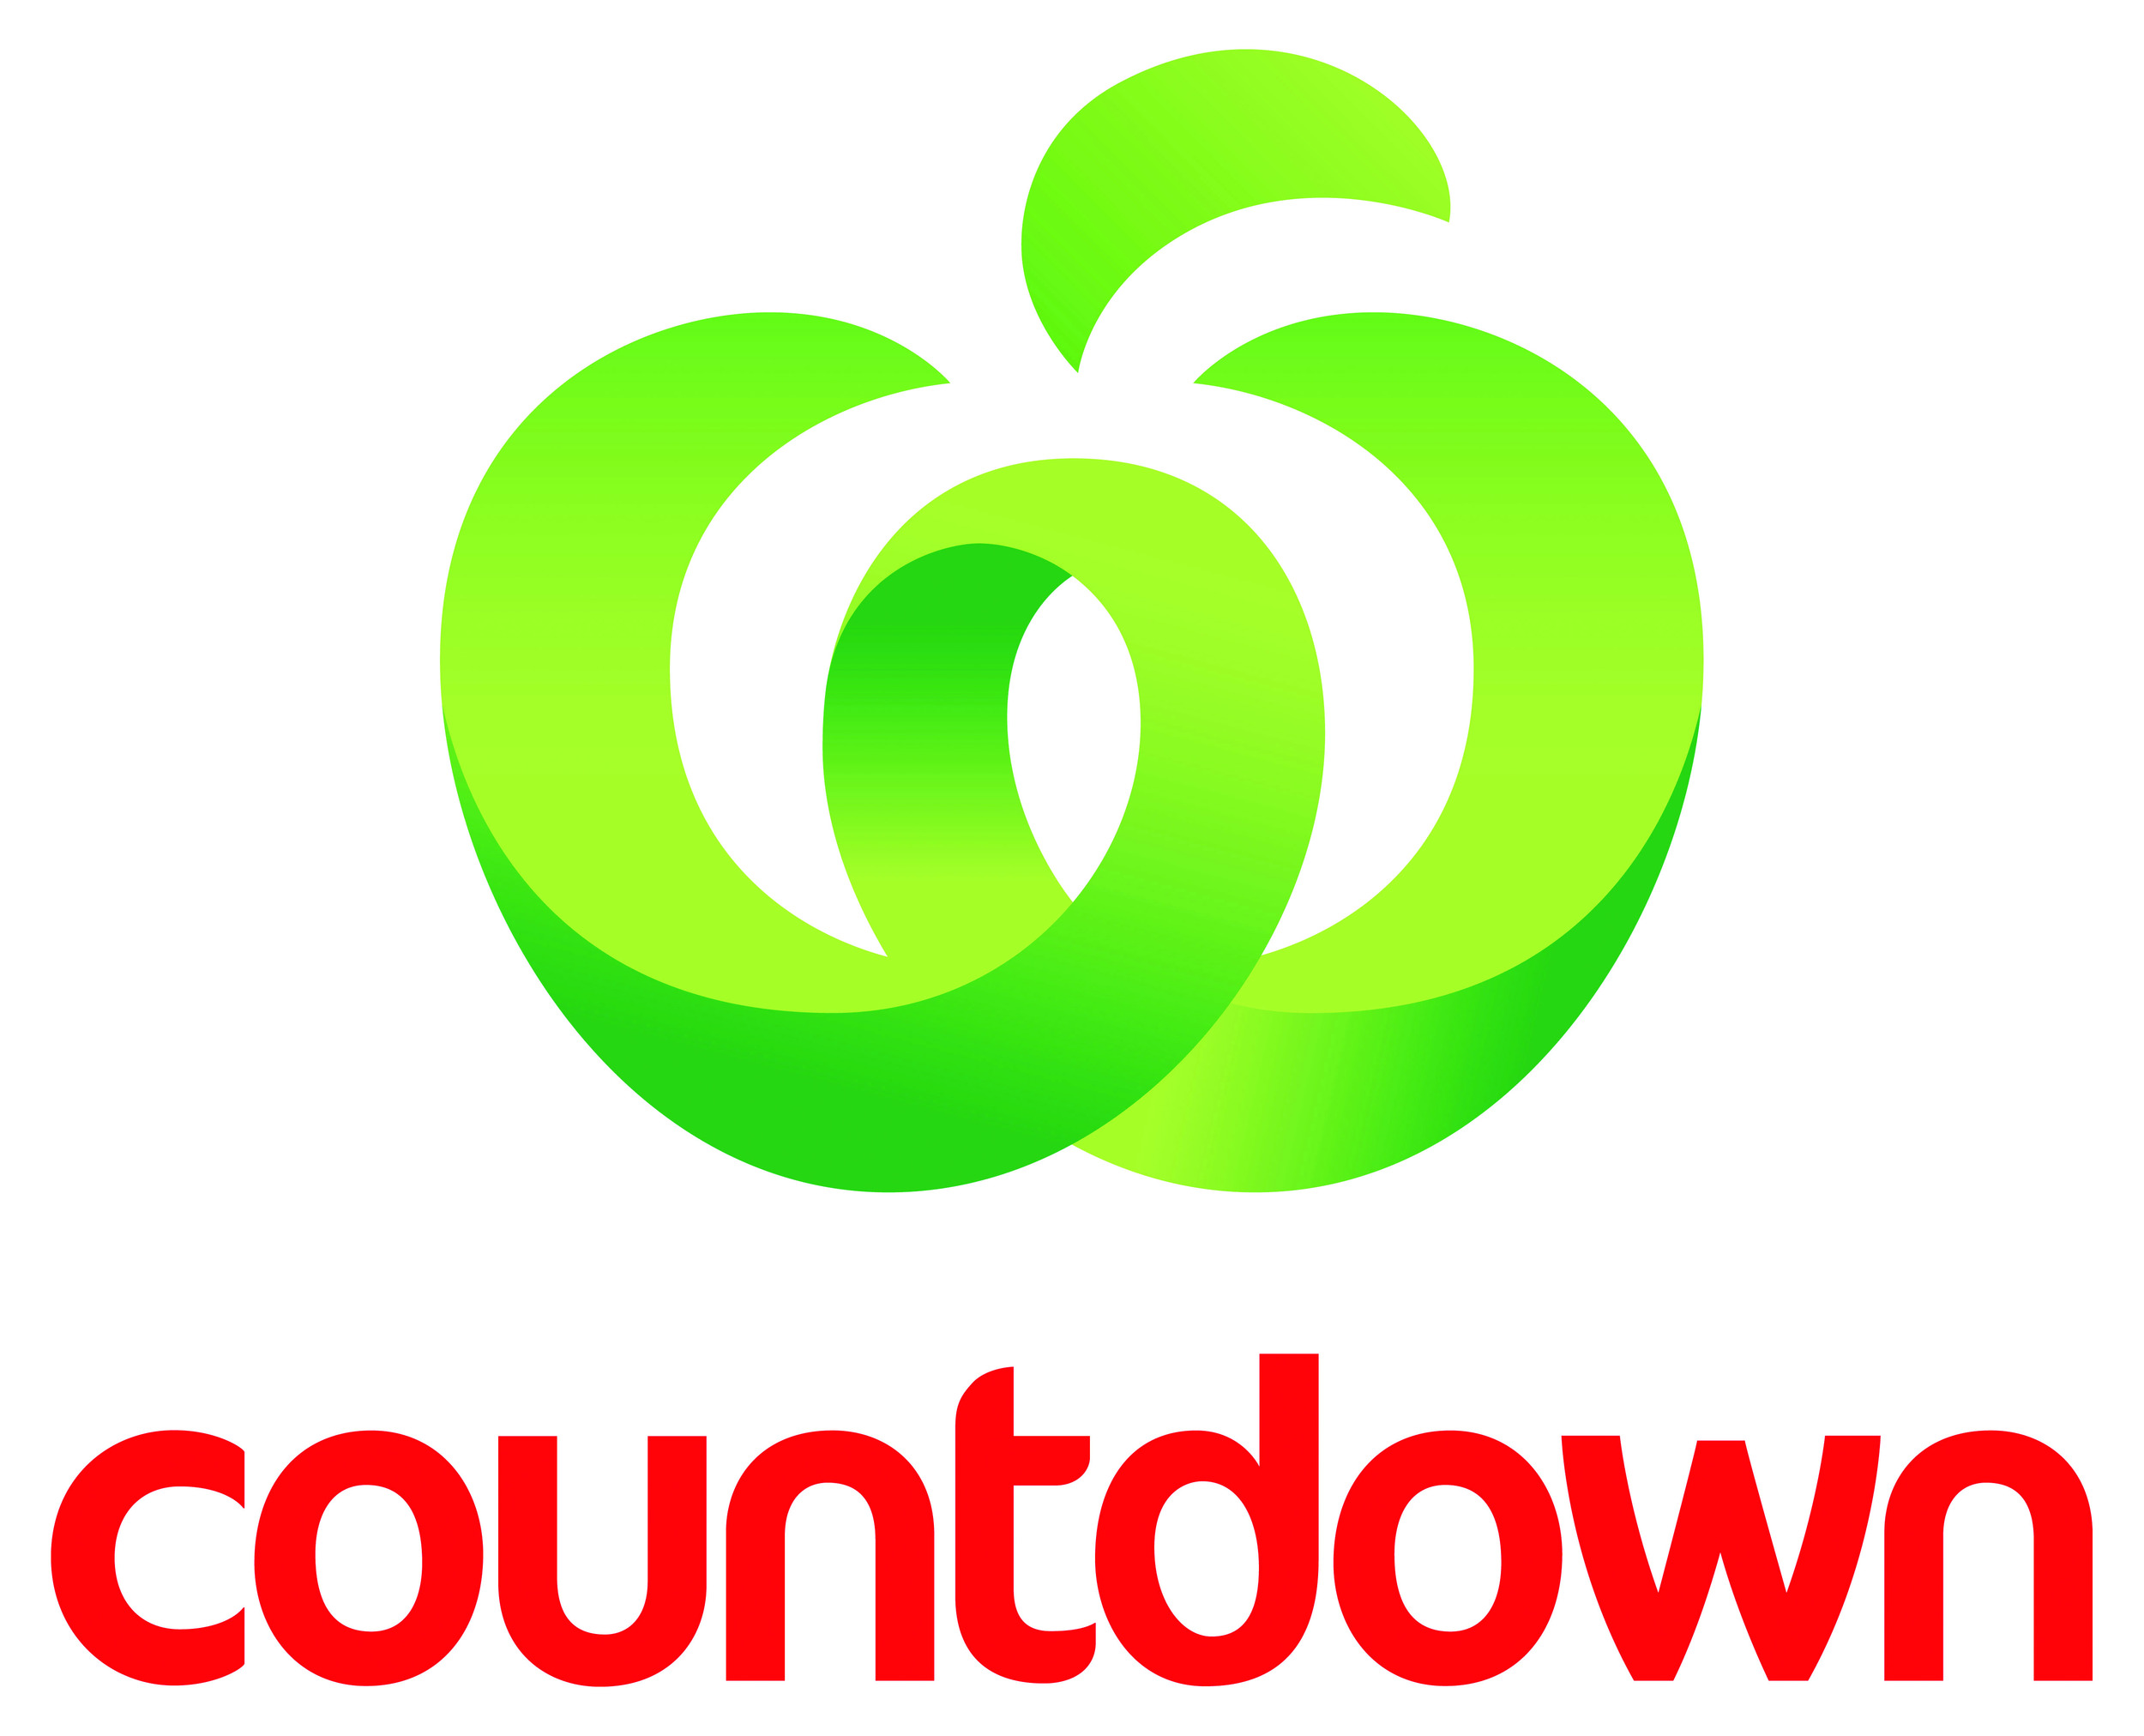 Countdown_V_Pos_cmyk (larger).jpg